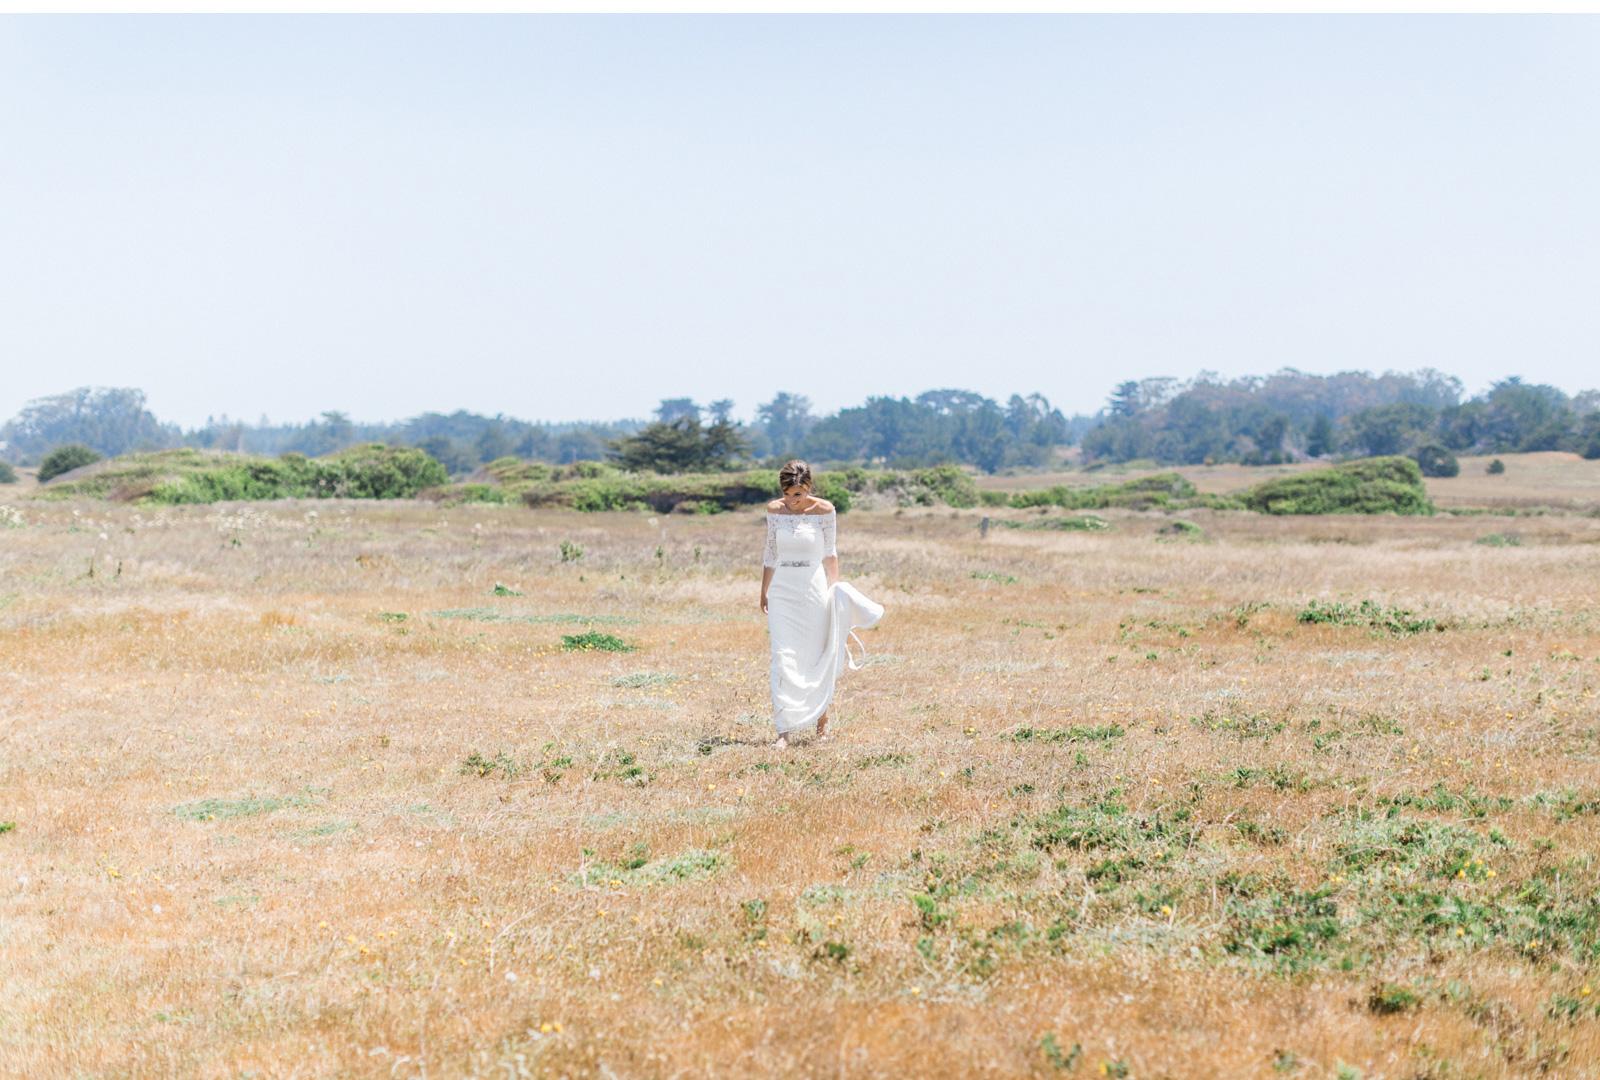 Mendocino-Wedding-Natalie-Schutt-Photography_03.jpg